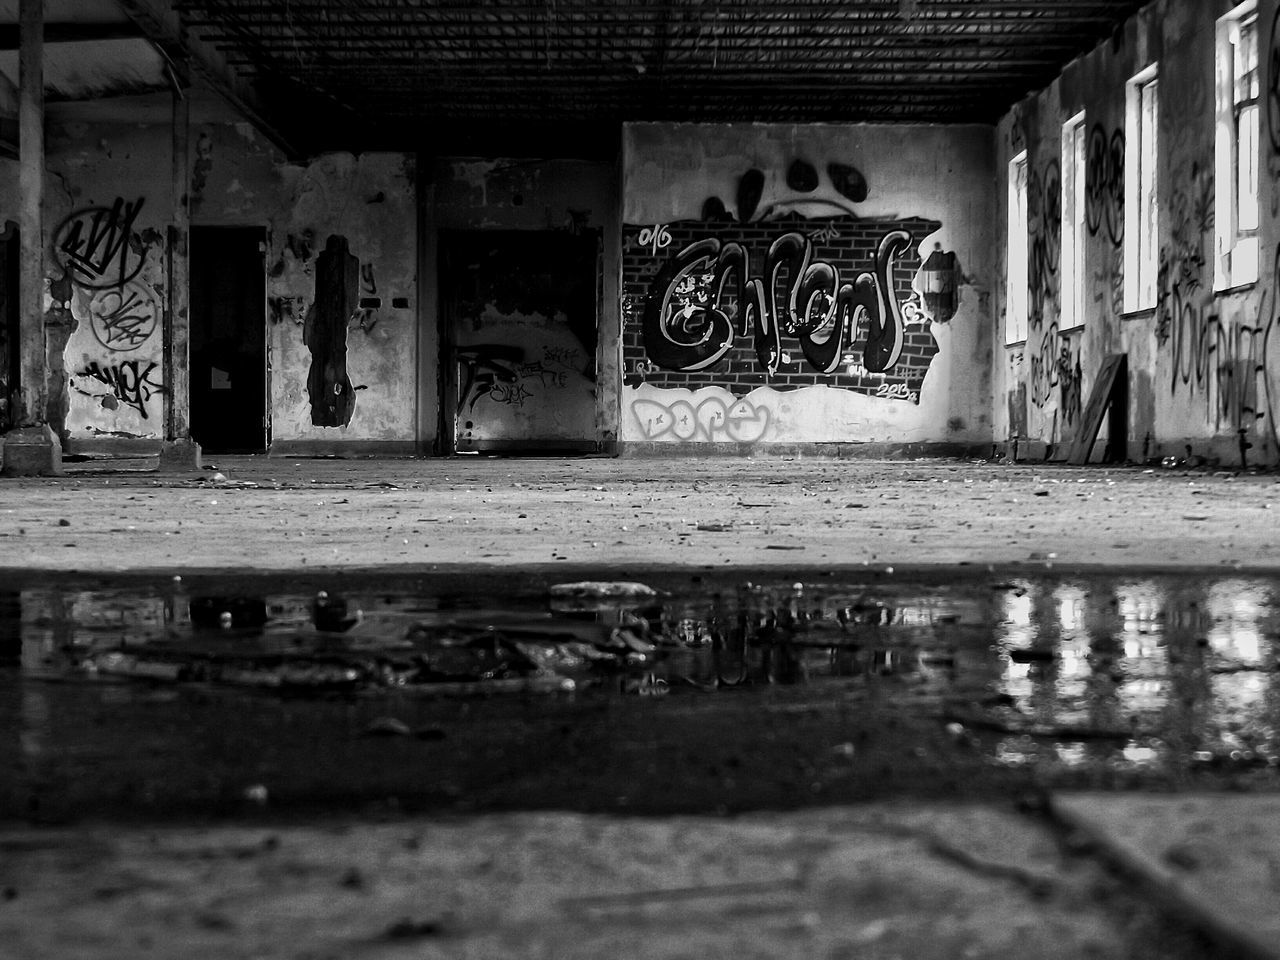 Graffiti In Abandoned Factory